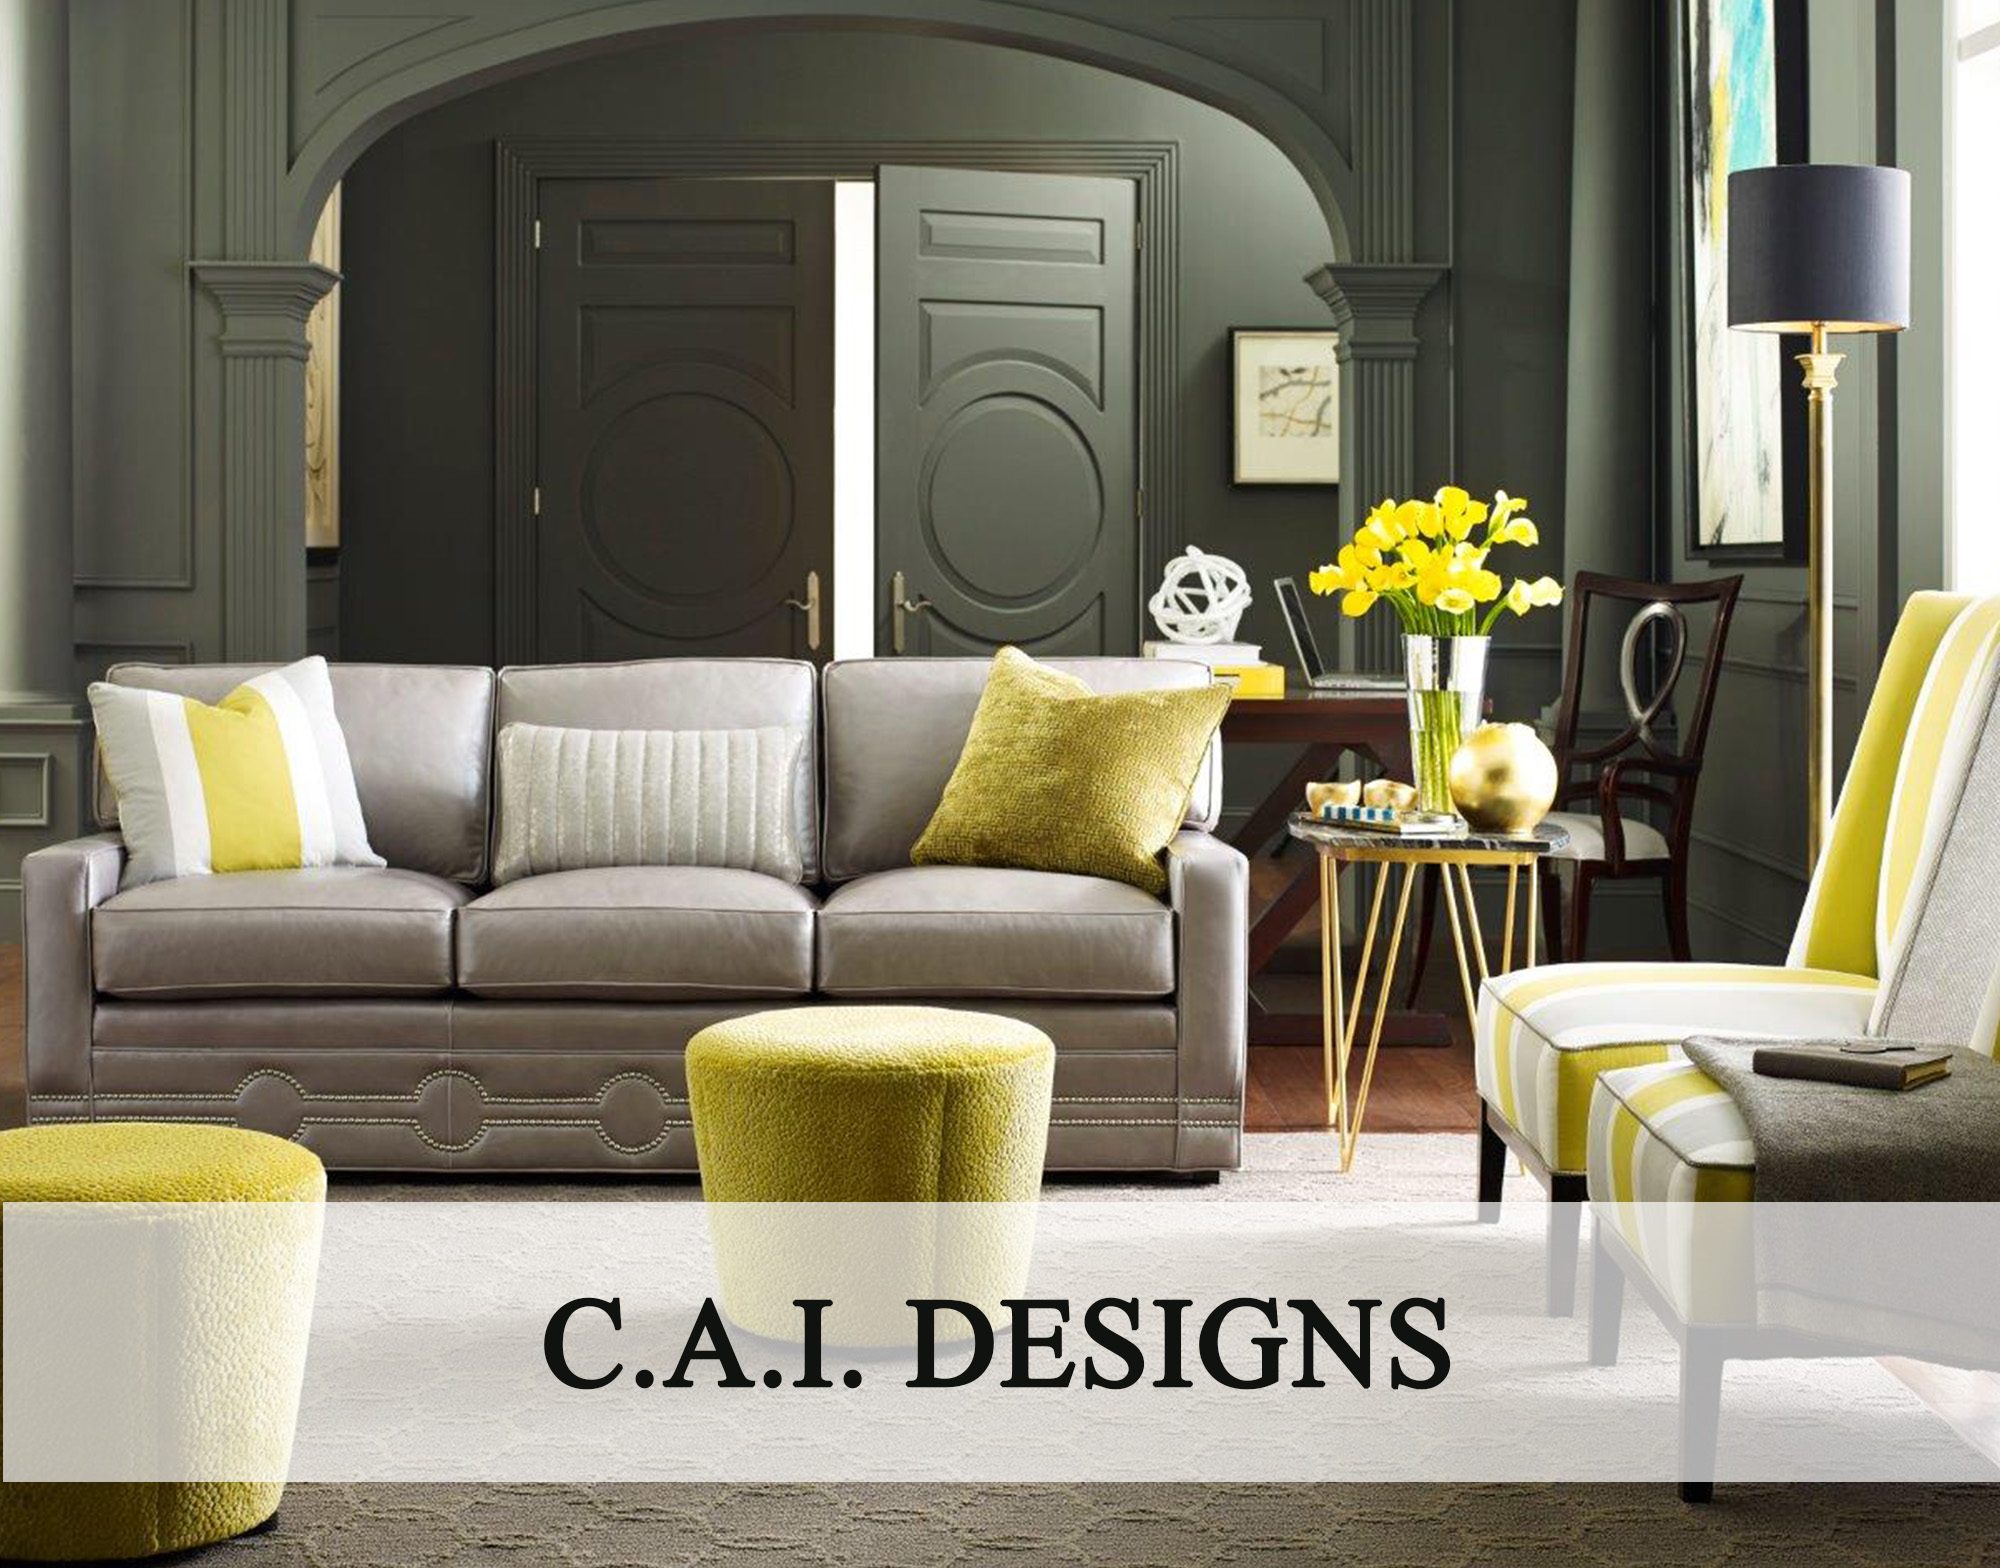 C.A.I. Designs